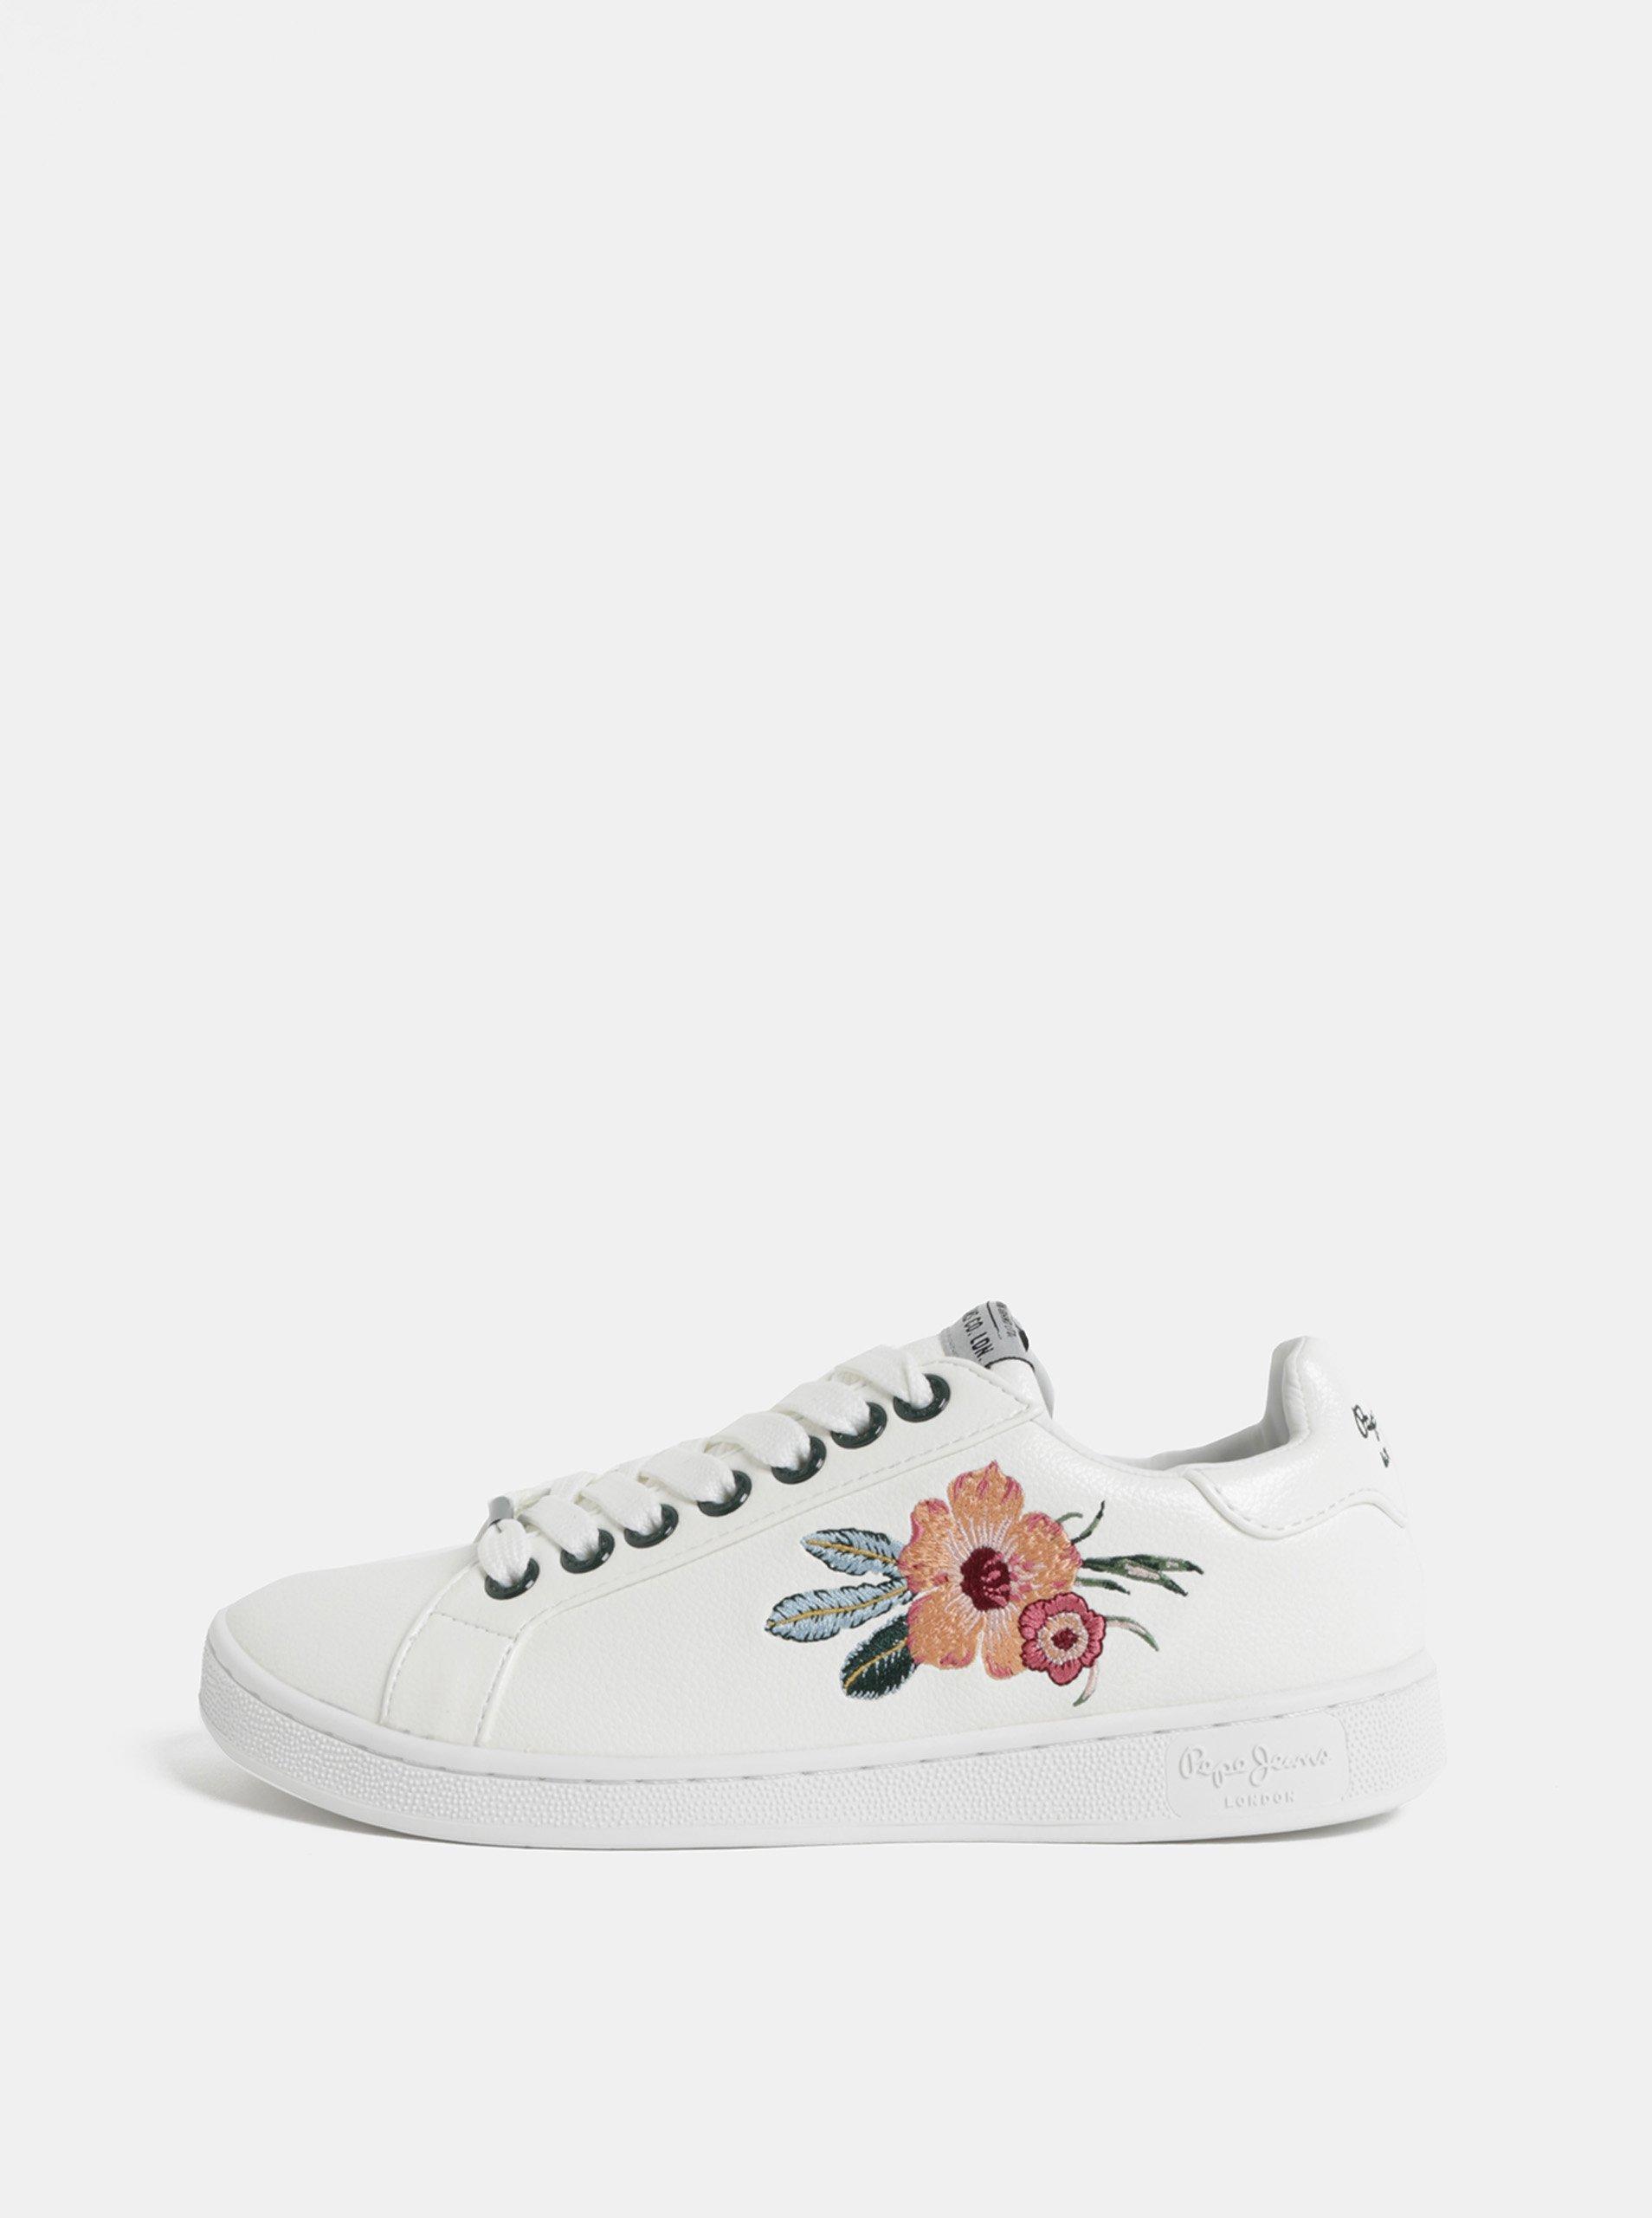 c57b0b31b61 Biele dámske tenisky s výšivkou Pepe Jeans Brompton flower